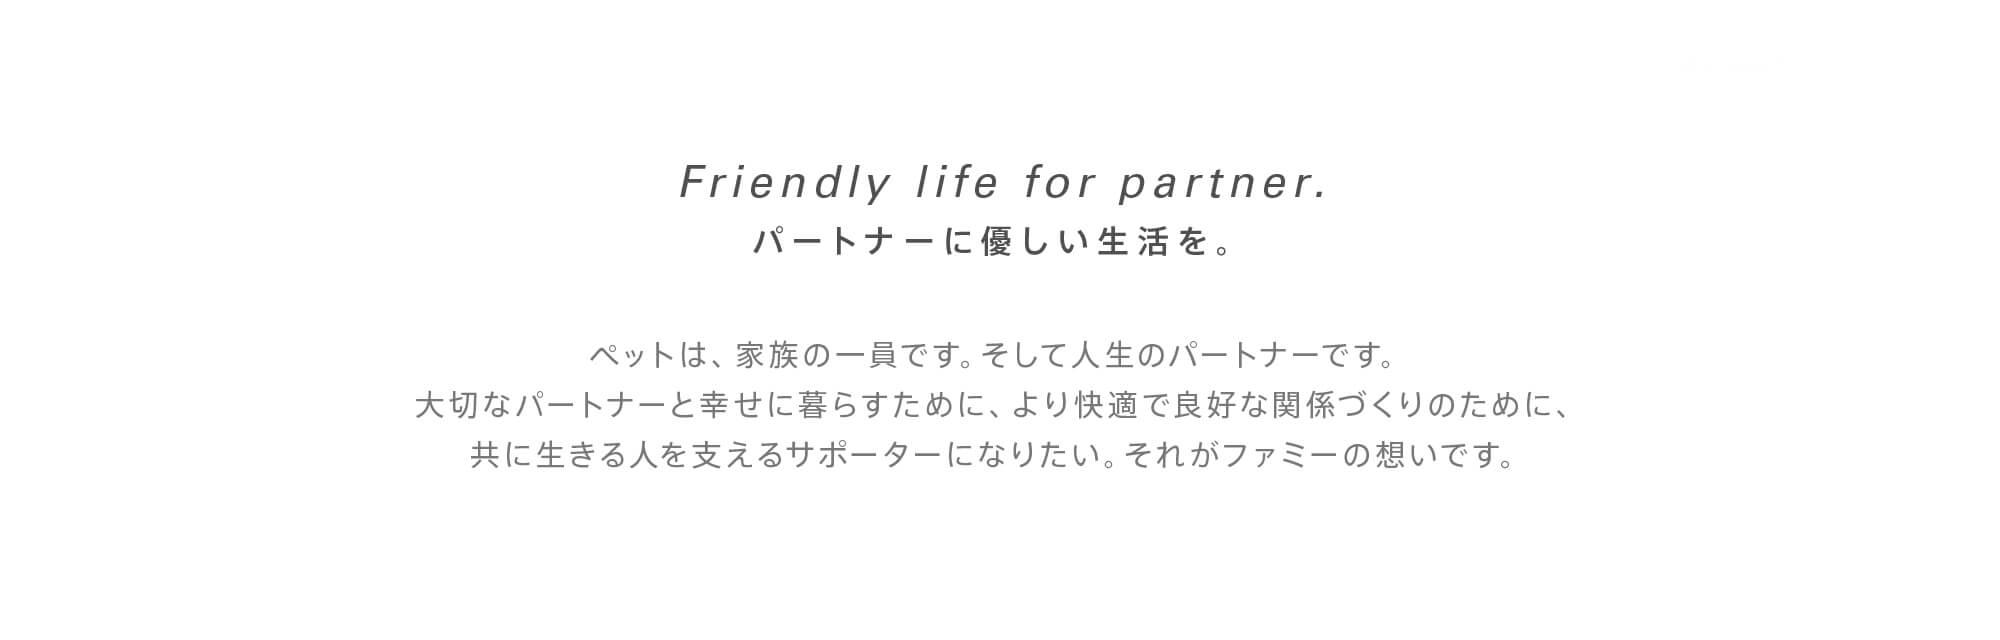 Friendly life for partner.パートナーに優しい生活を。